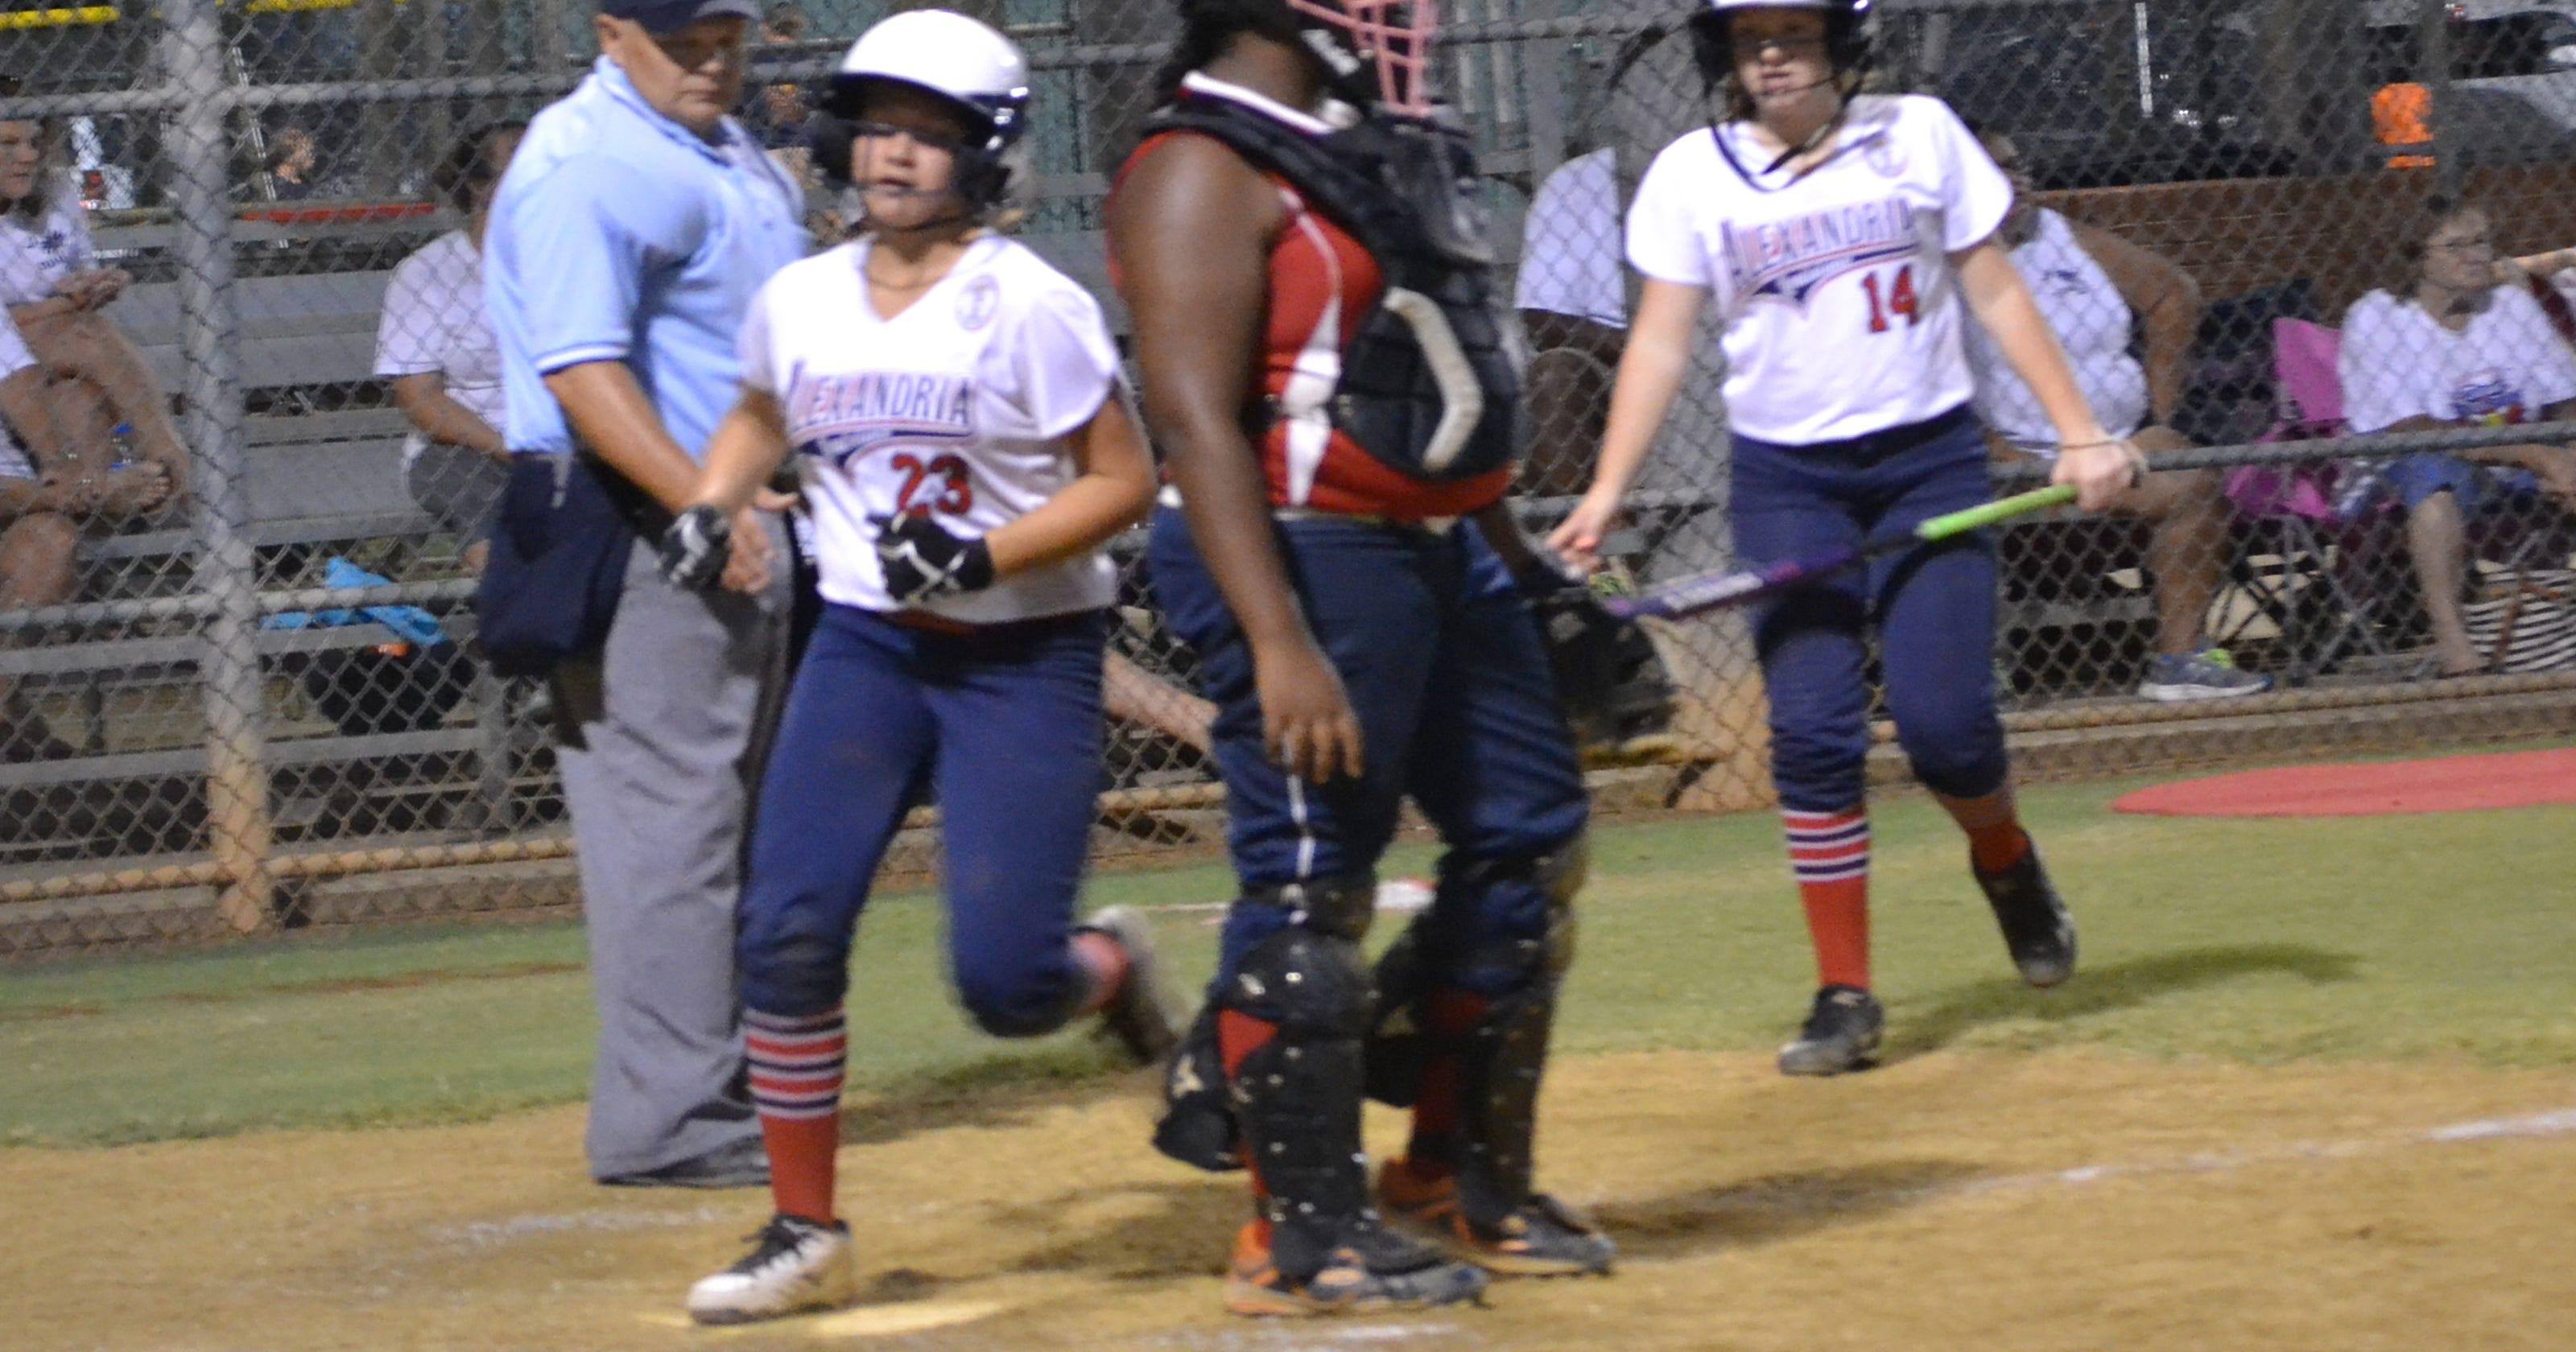 5 area Dixie Softball teams coast to World Series titles